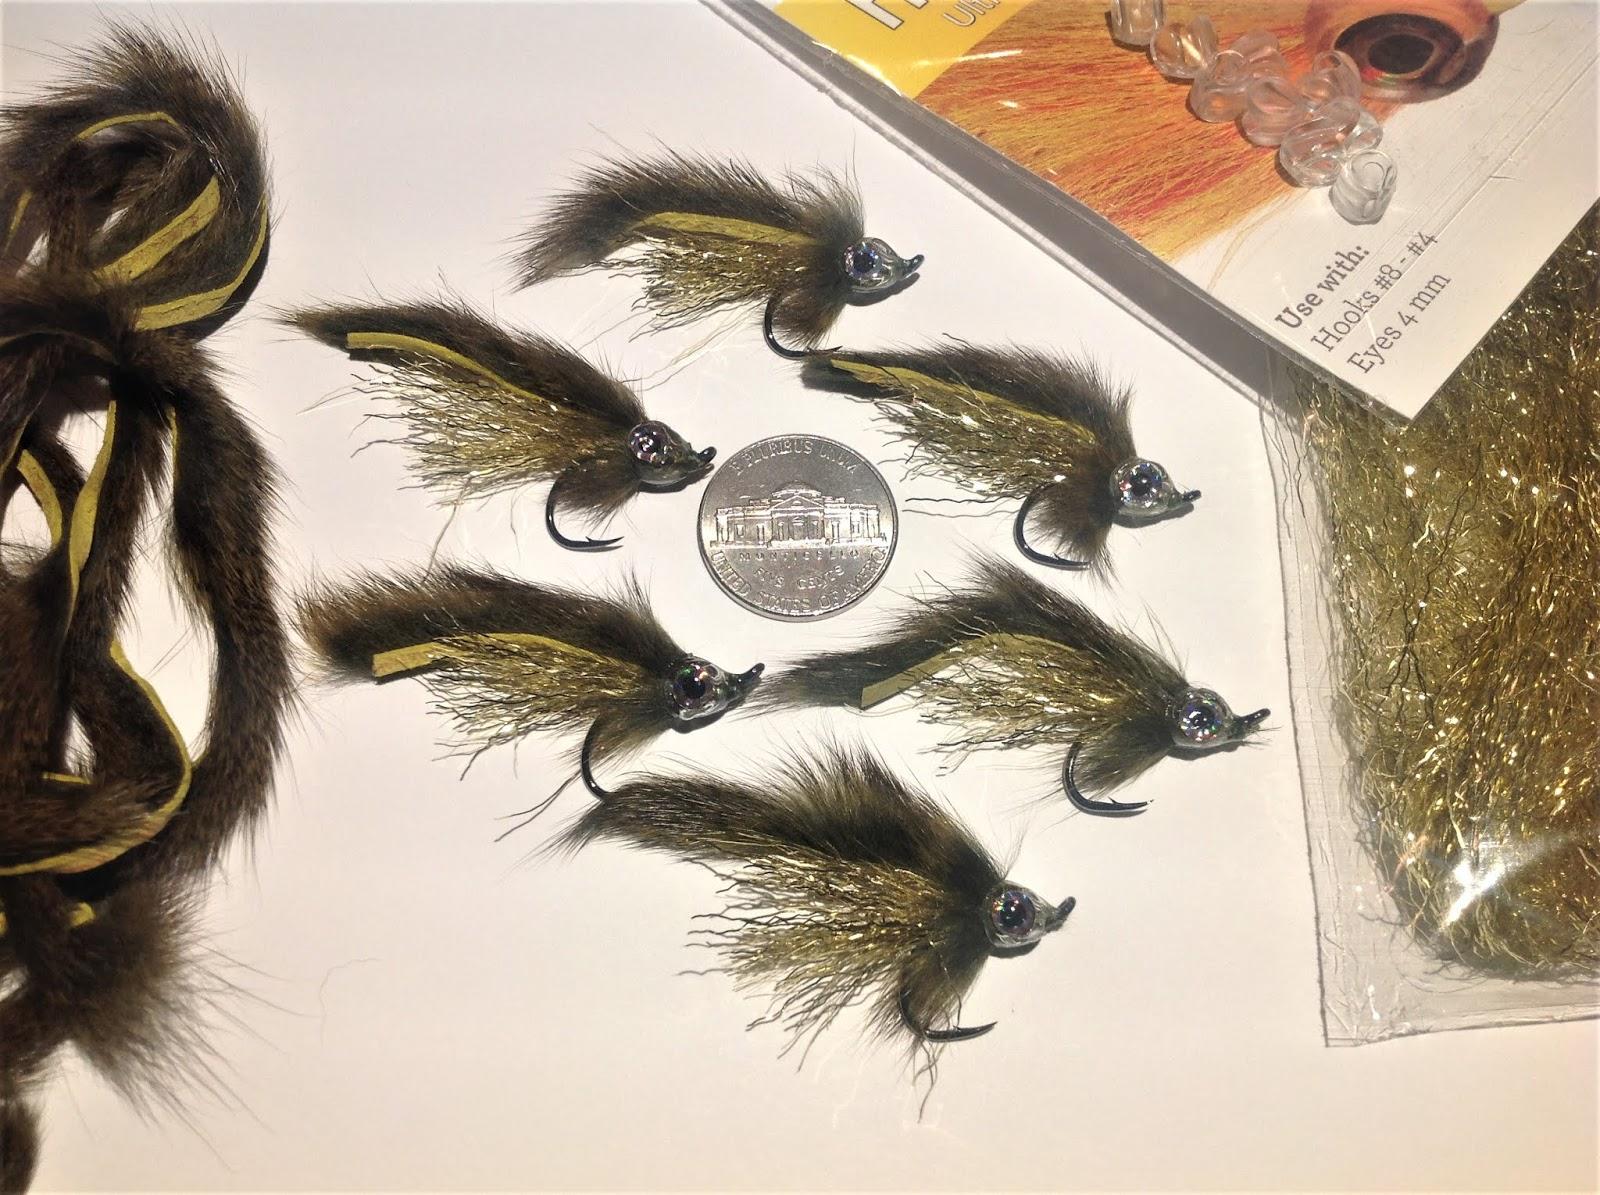 streamer. 12 flies bead head Zonker – olive – red gills – silver body